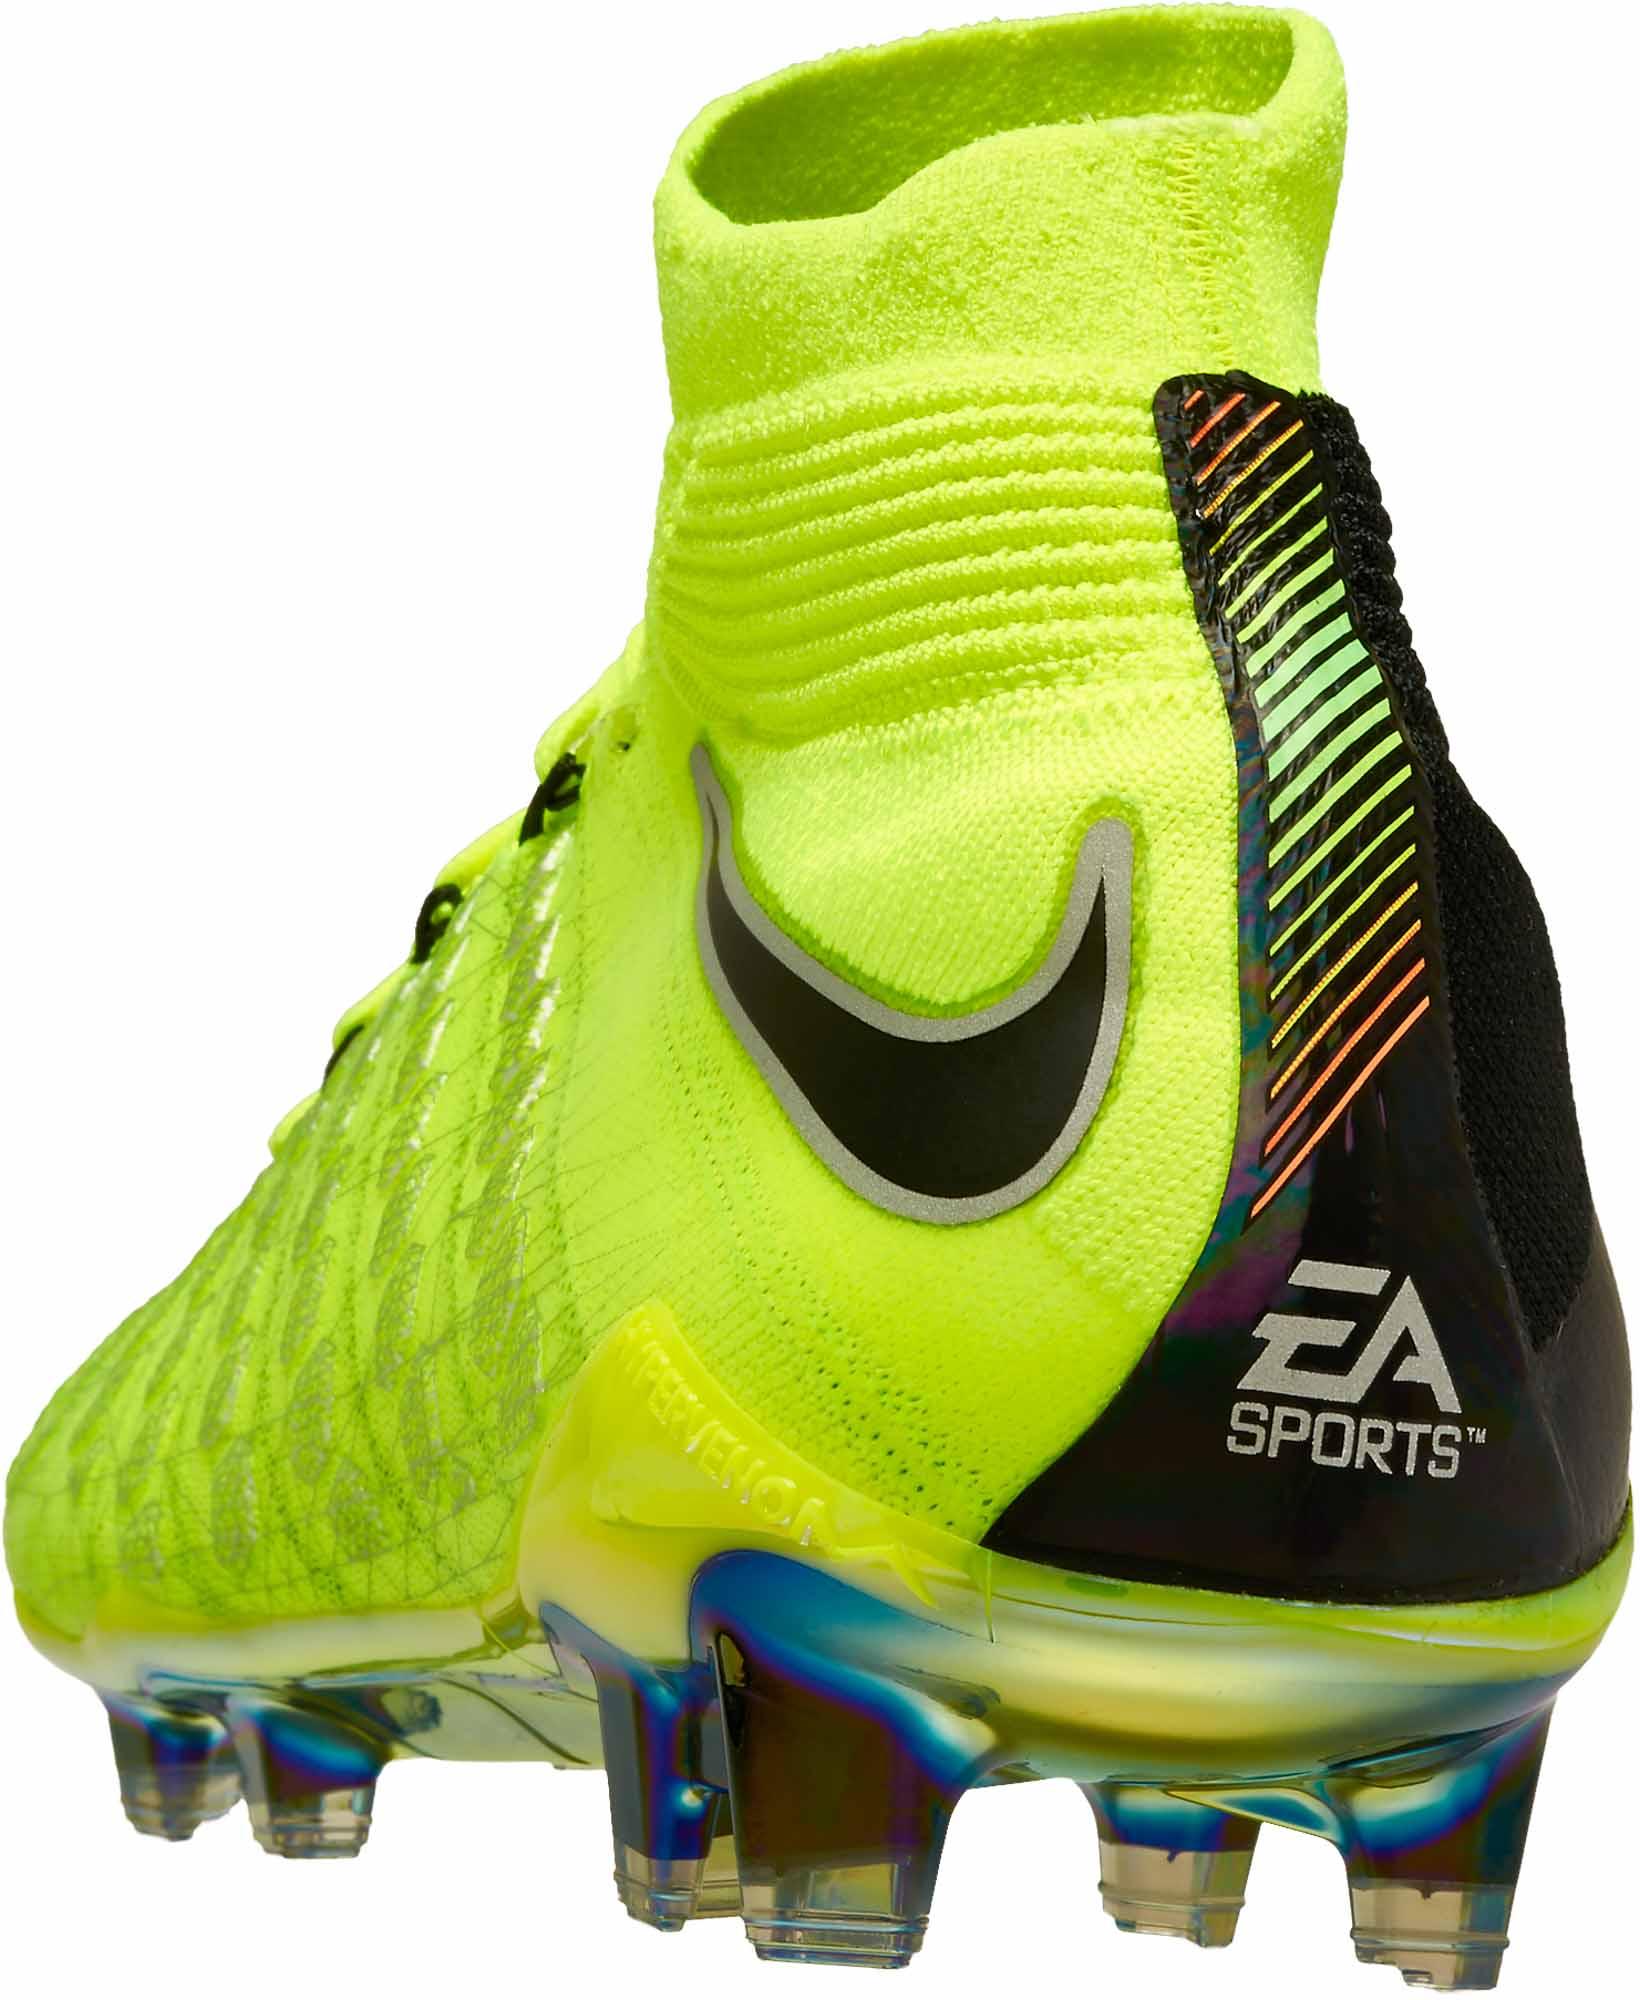 0996867a0 Nike Hypervenom Phantom III DF FG – EA Sports – Volt Black